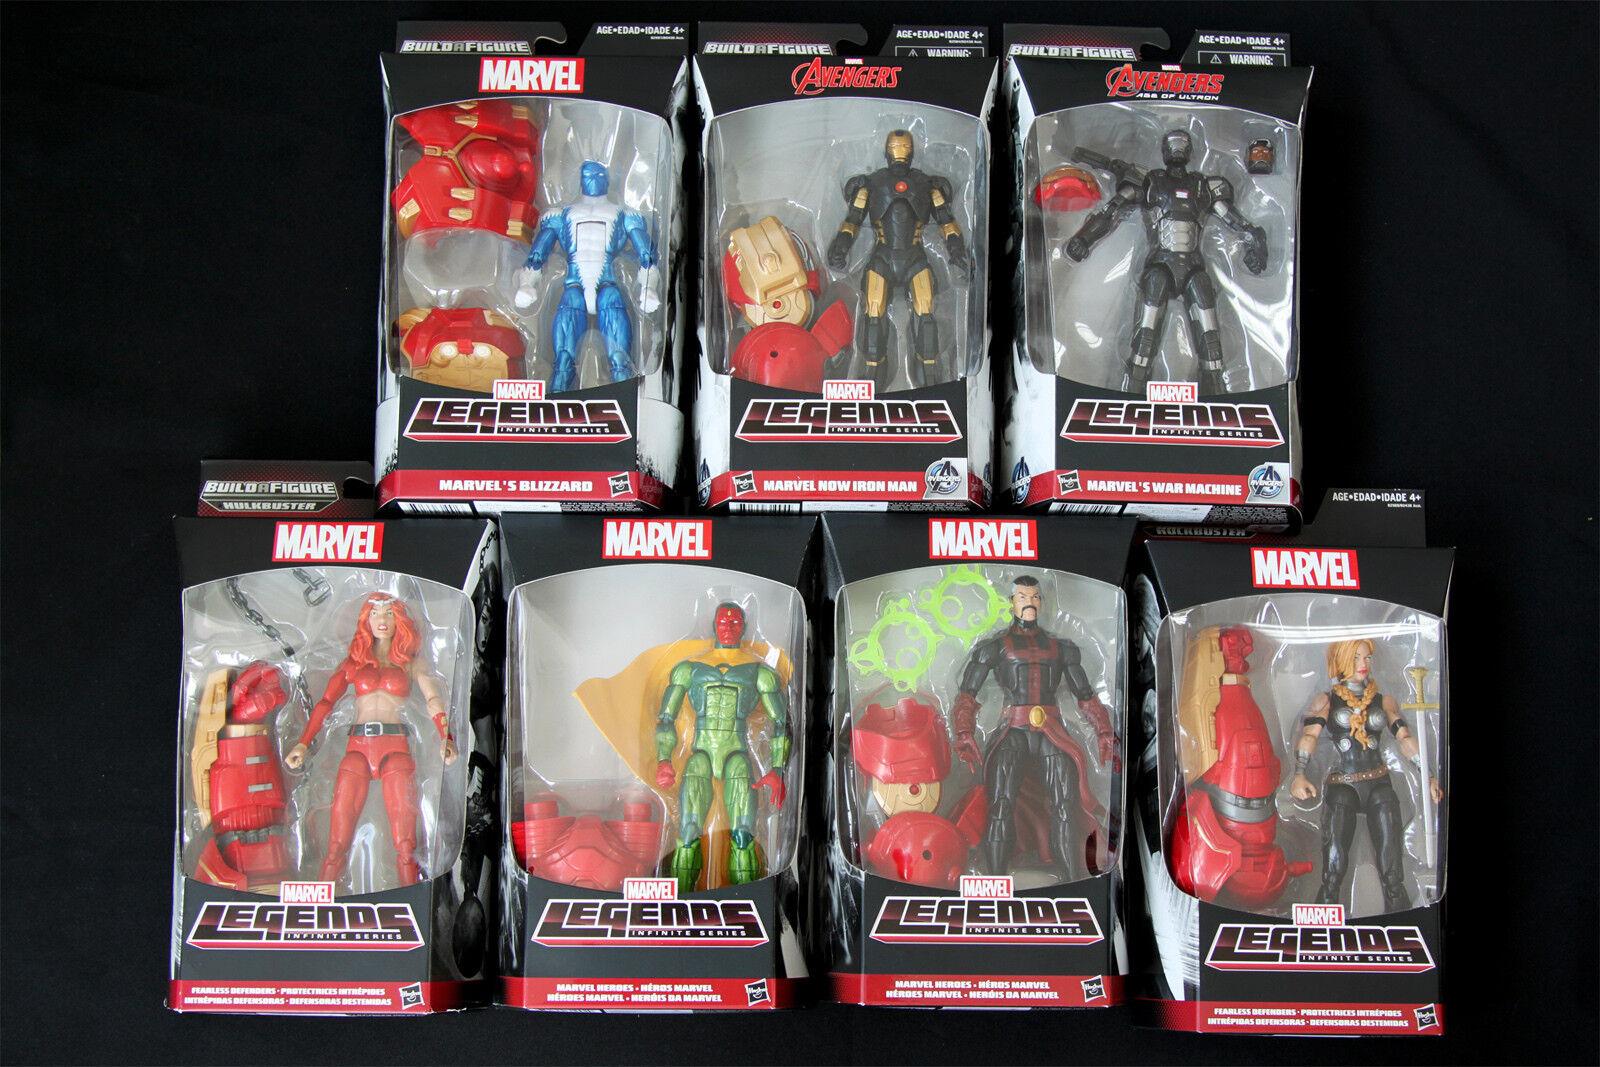 Marvel - legenden unendliche serie  alter ultron hulkbuster satz 7 abb.